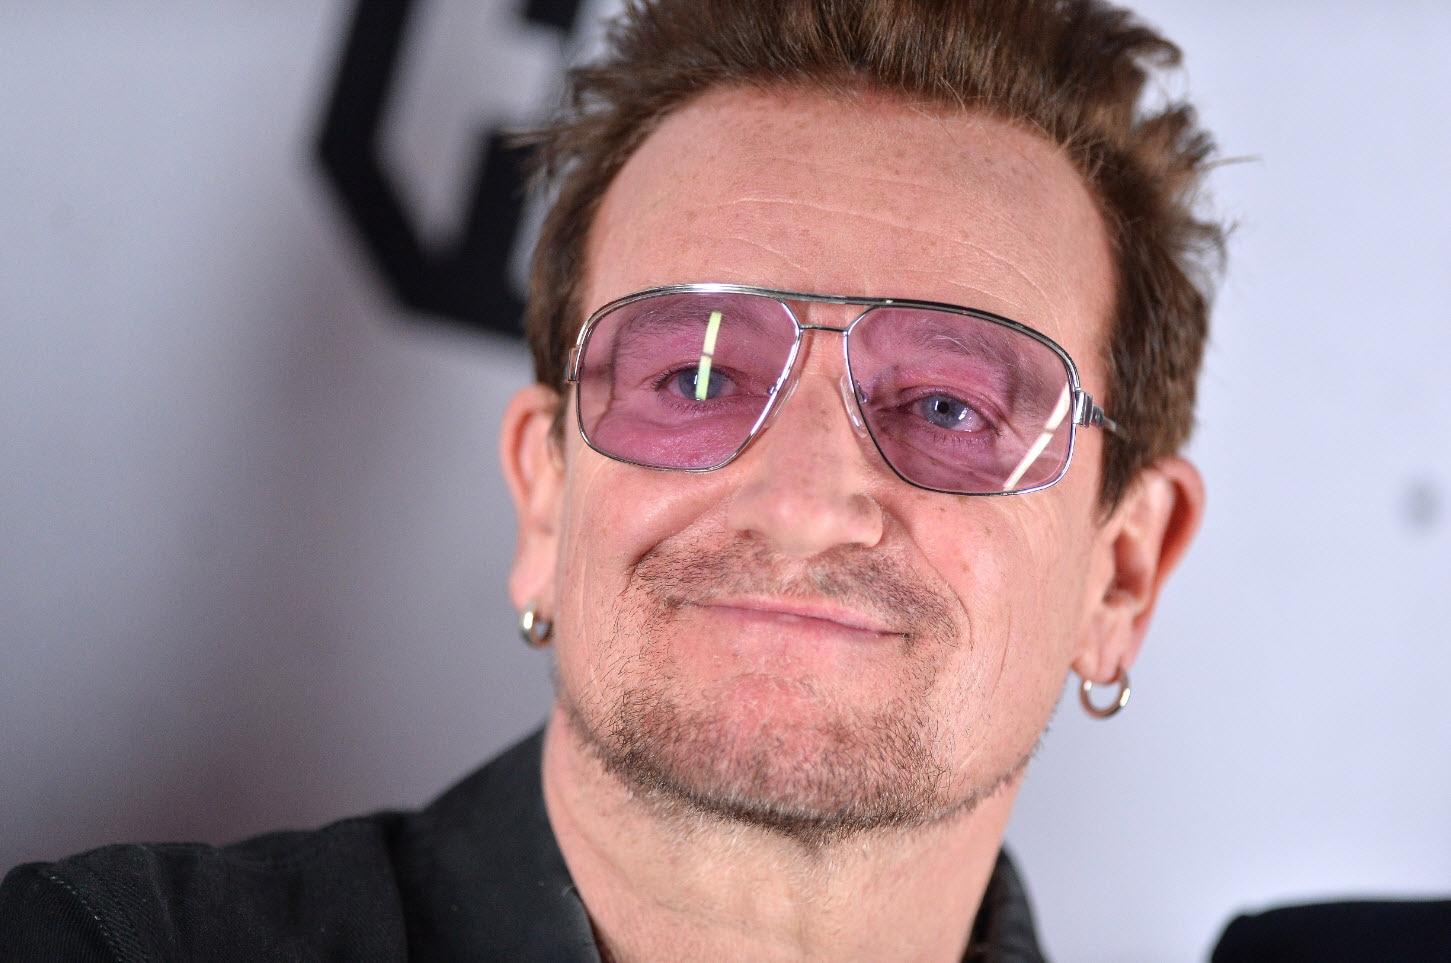 Irish rock star and activist Bono